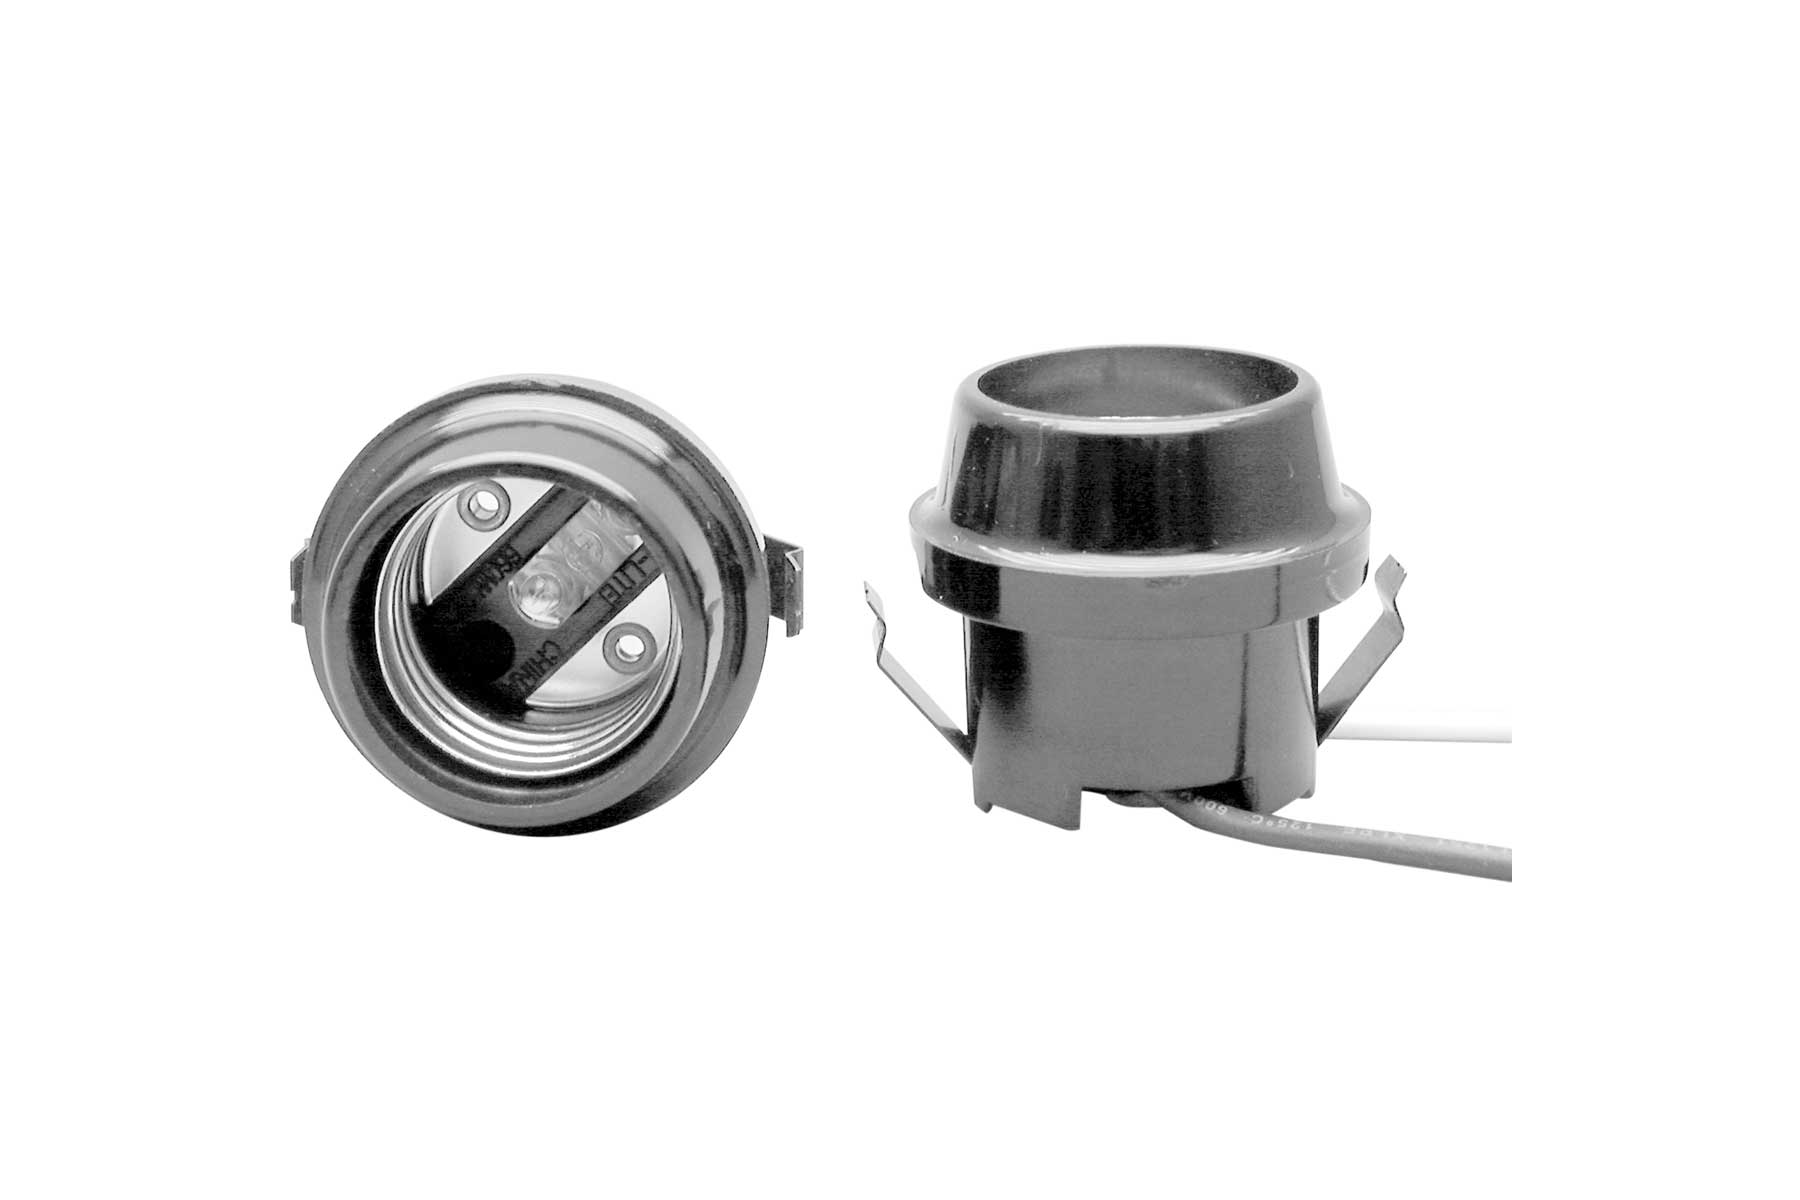 Medium Base Tapered Top Flanged Phenolic Keyless Incandescent Light Socket